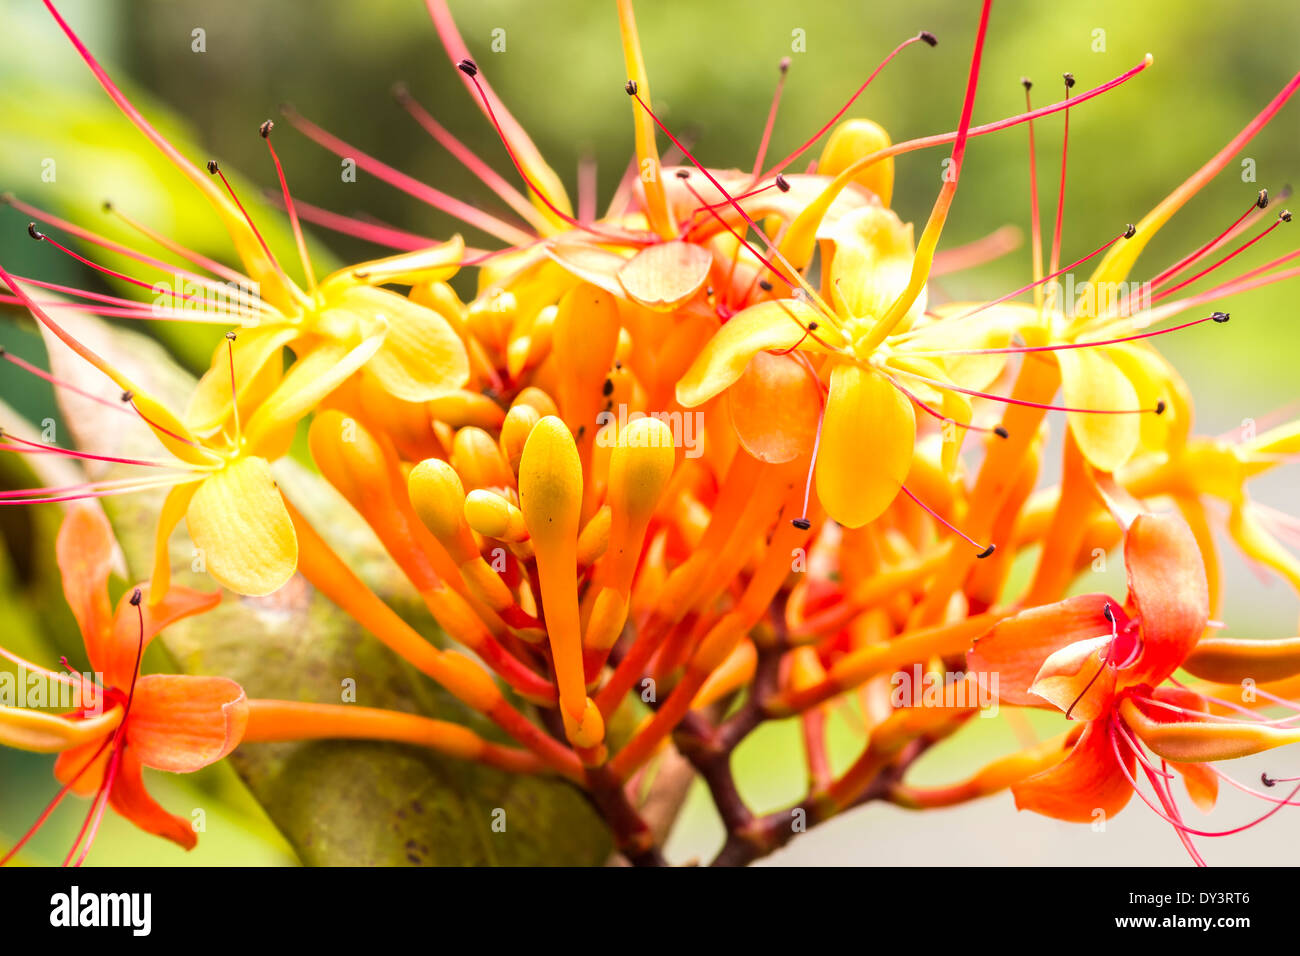 Ashoka tree flower saraca indica stock photos ashoka tree flower the colorful orange and yellow blooms of the tropical sorrowless tree stock image mightylinksfo